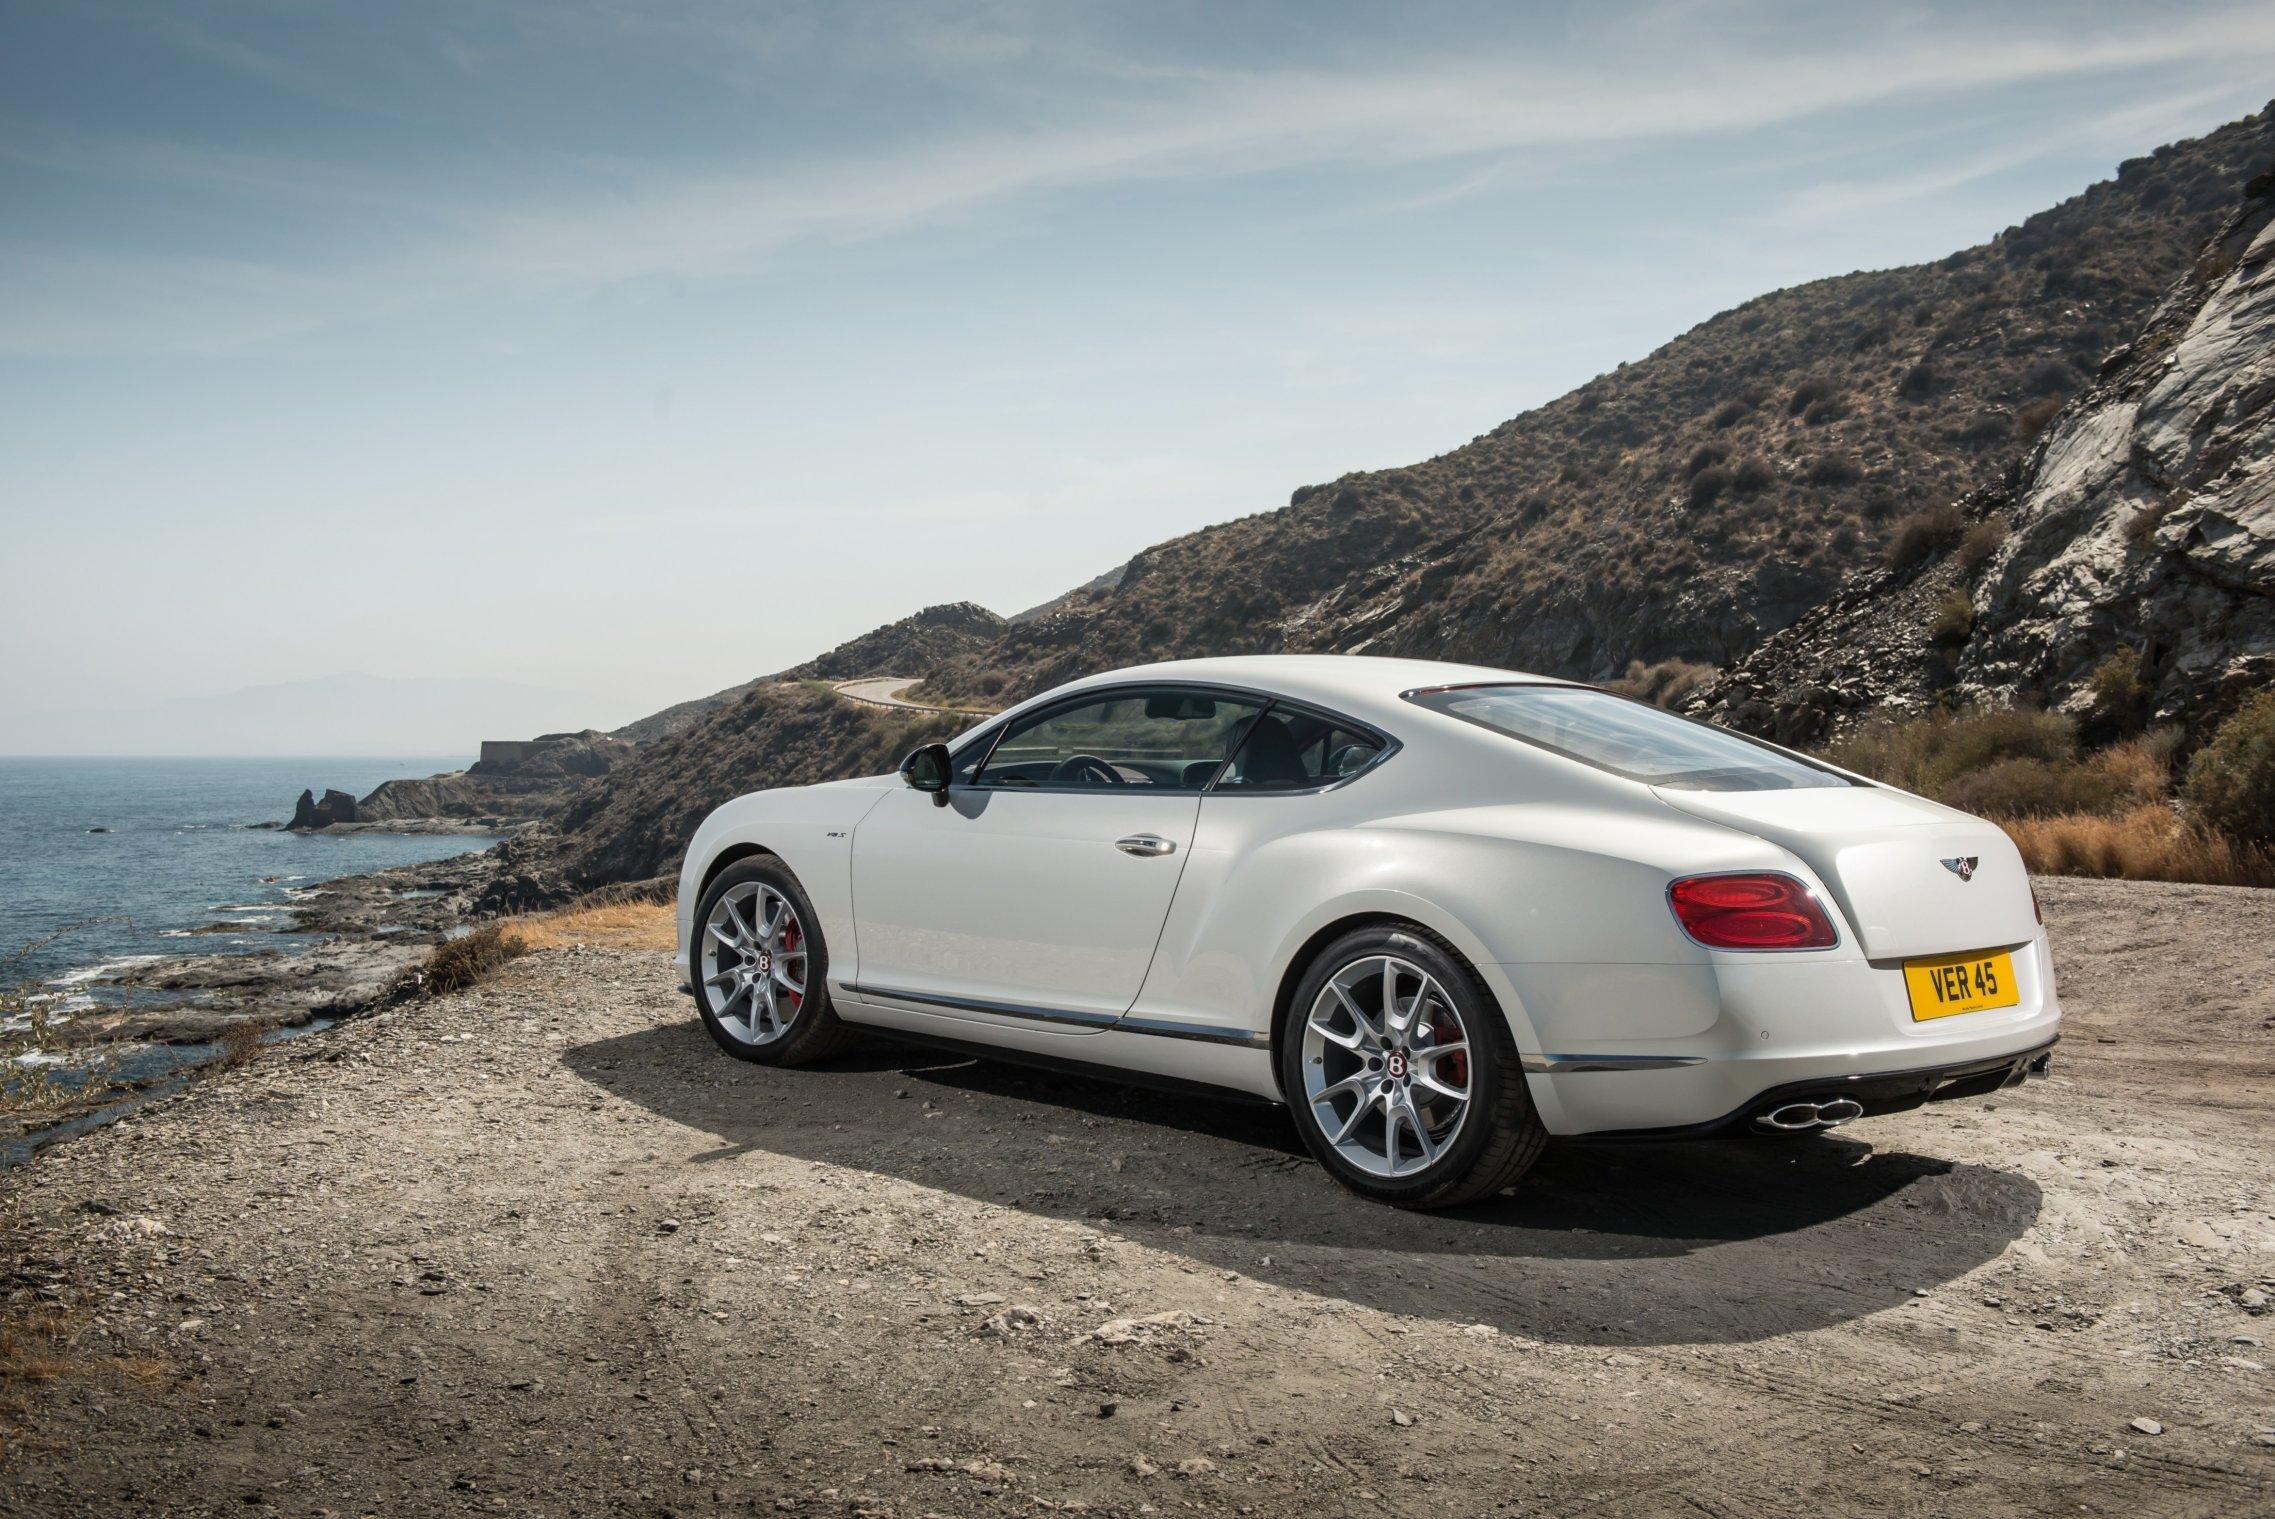 2018 Bently Continental Gt >> BENTLEY Continental GT specs & photos - 2011, 2012, 2013 - autoevolution